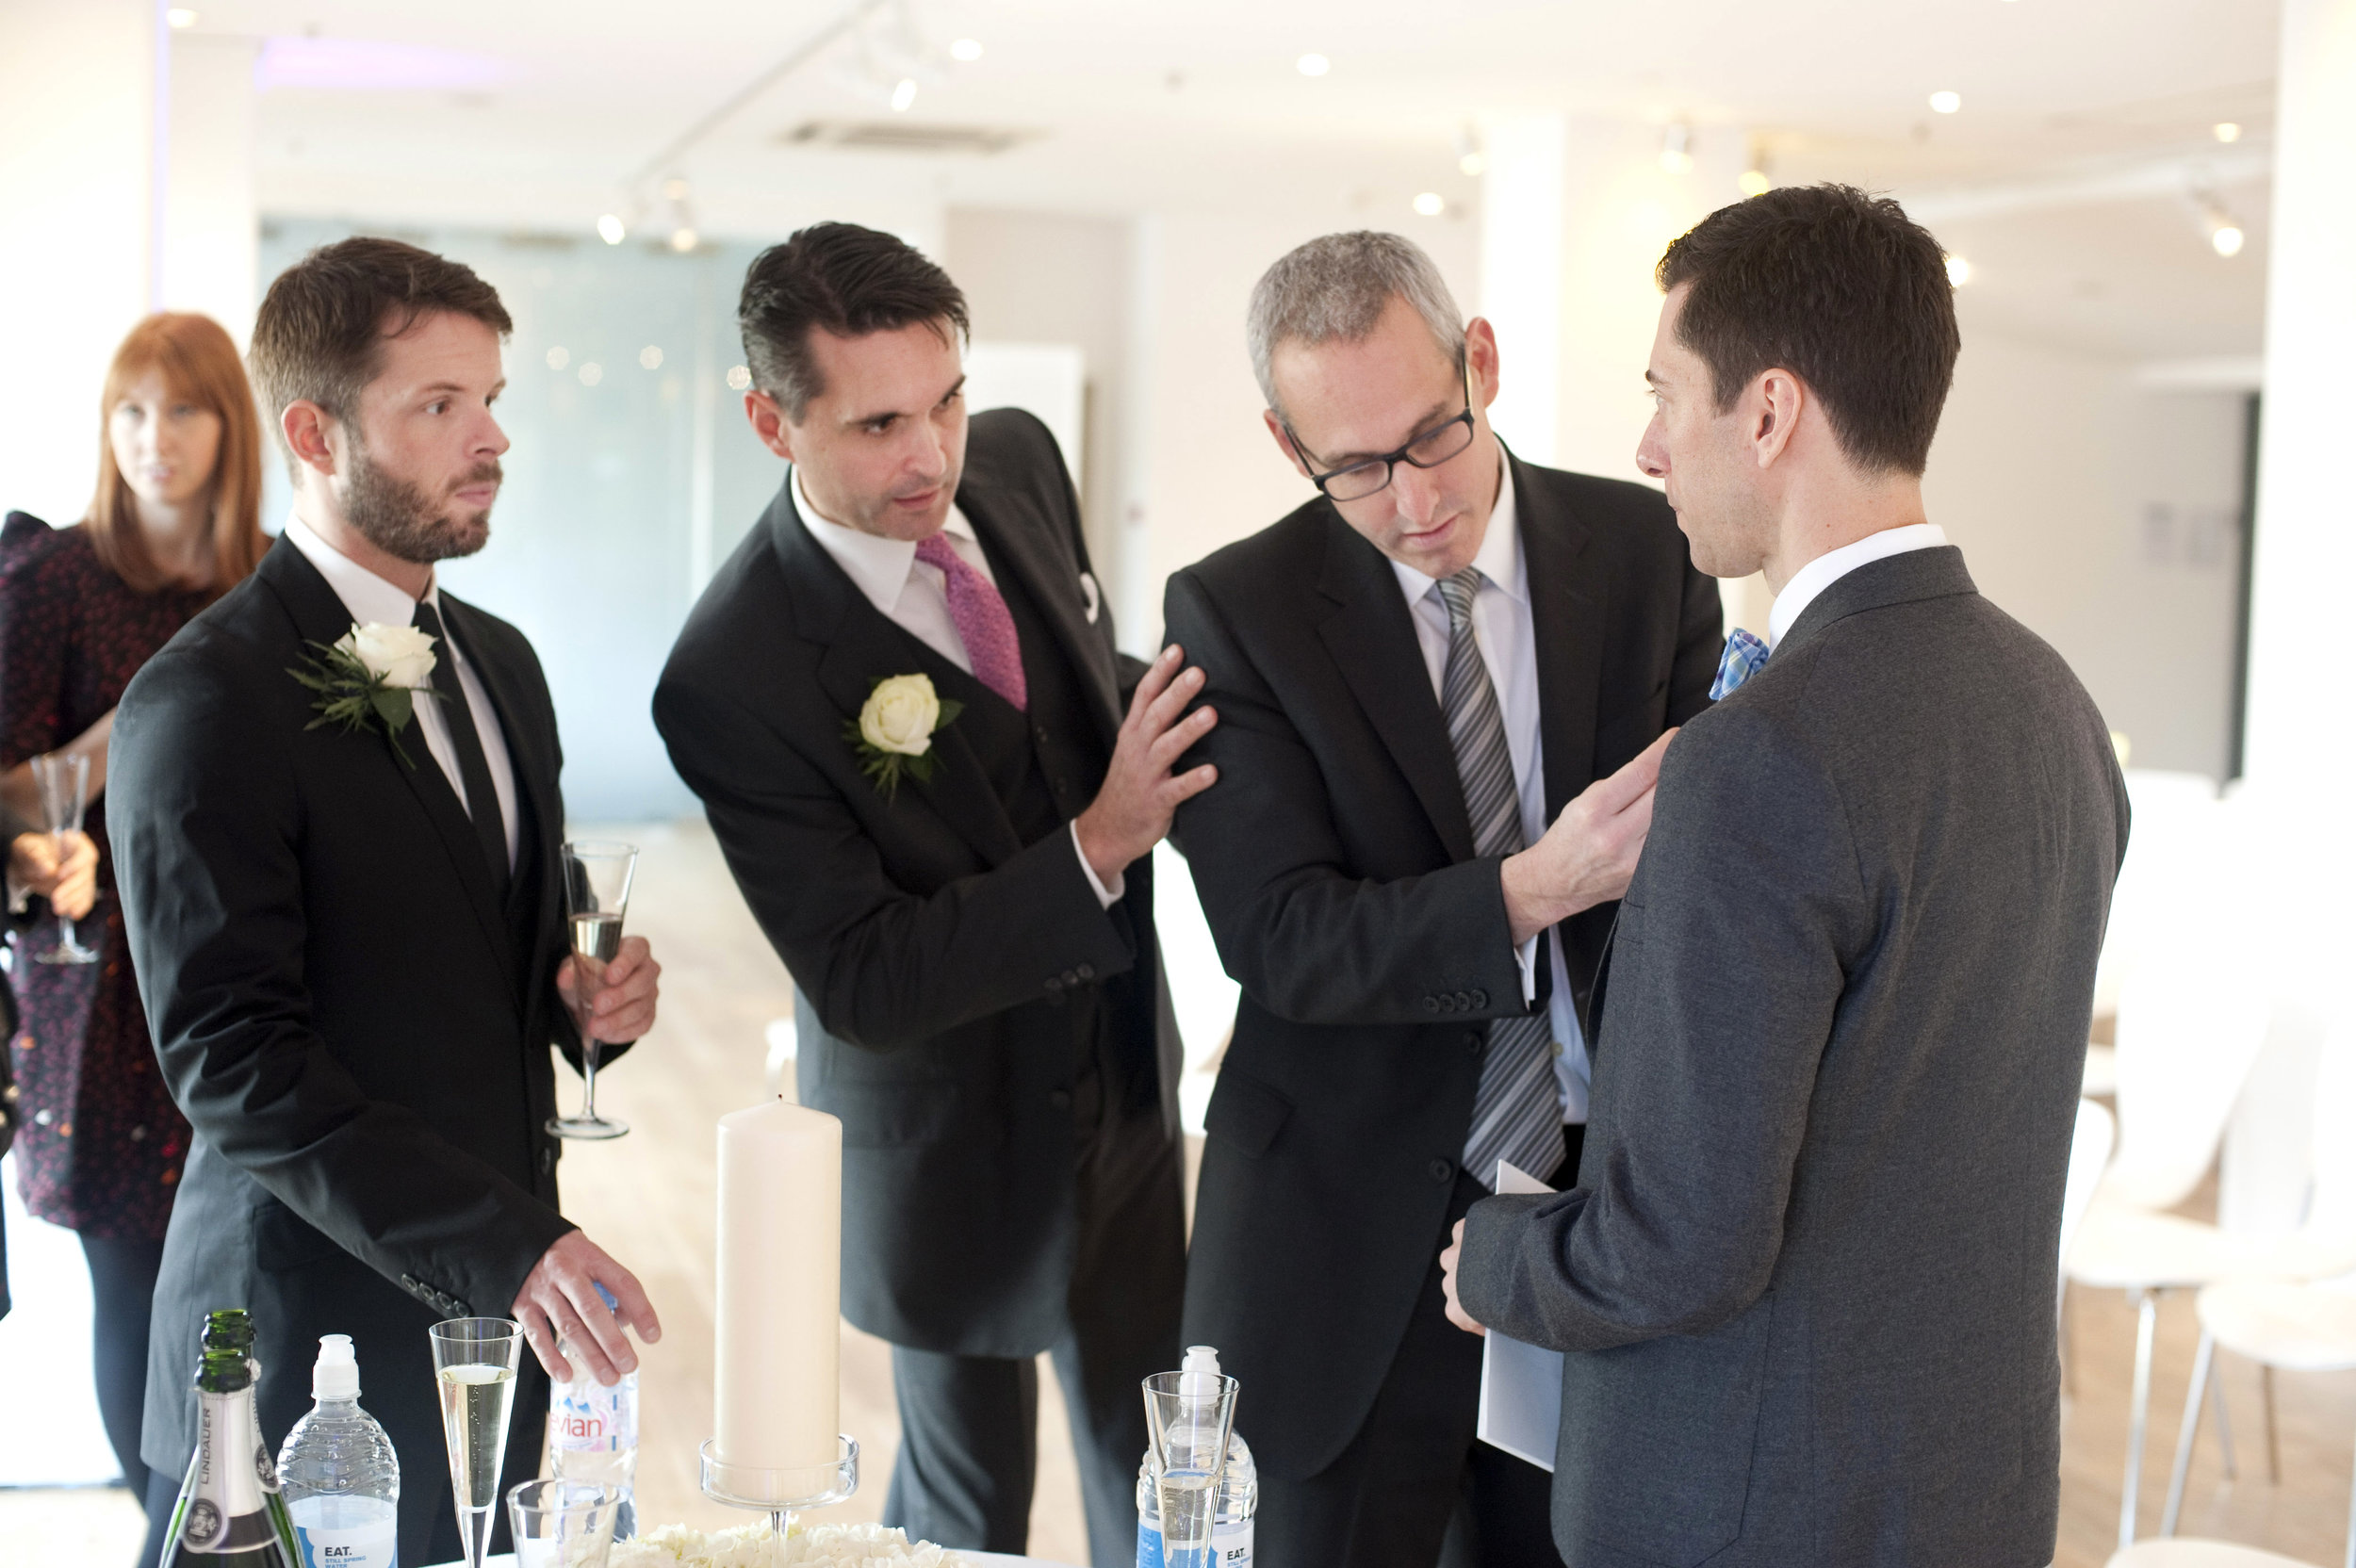 Groomsmen Give Last Minute Wardrobe Advice.jpg